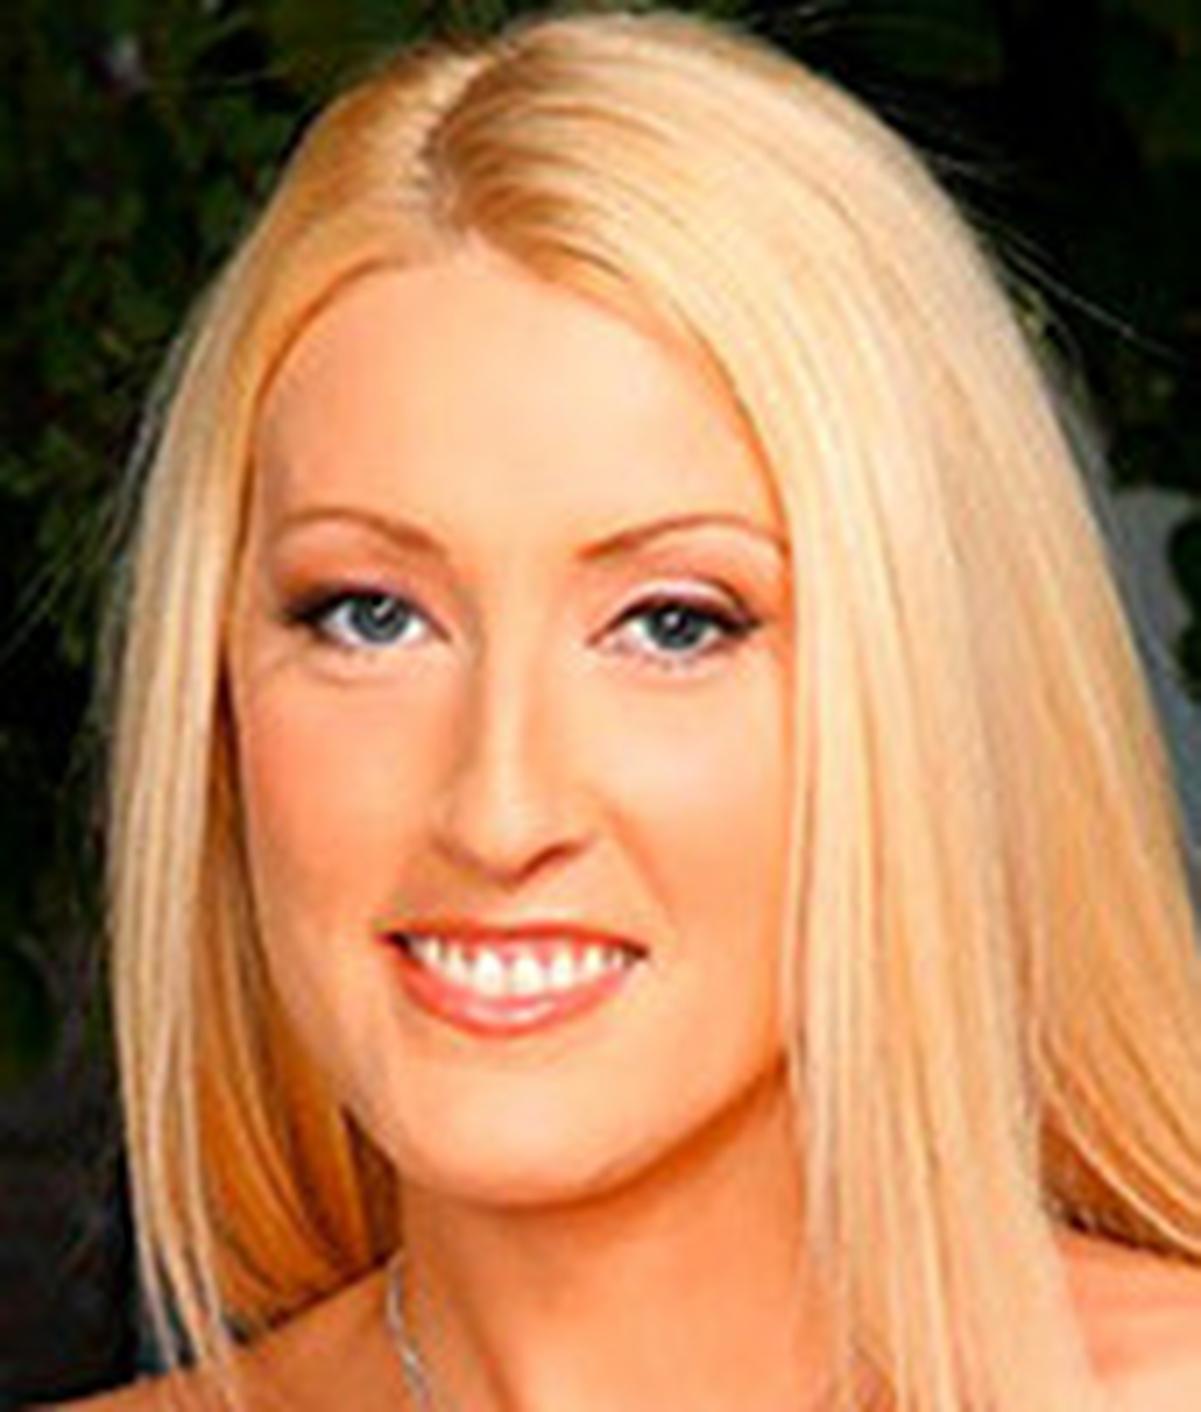 Amanda Logue Nude showing porn images for amanda logue sunny dae bdsm porn